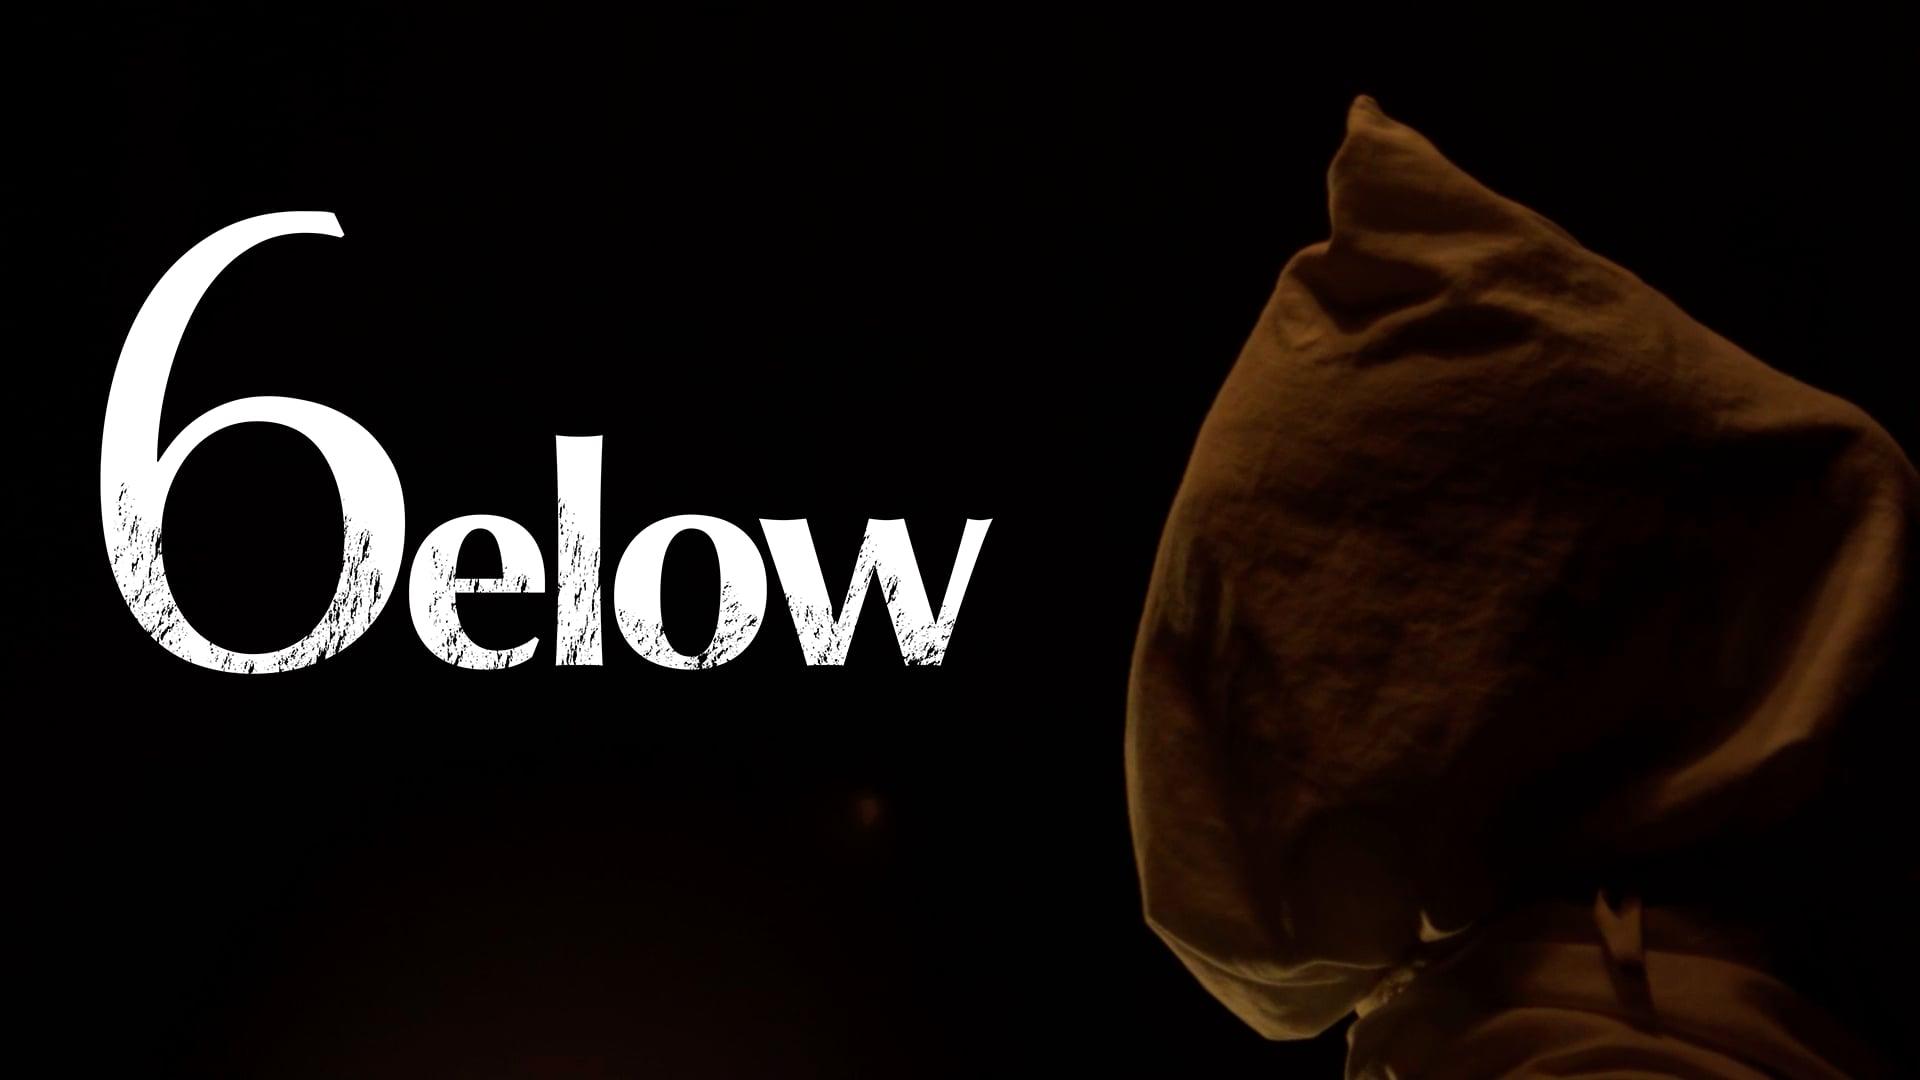 6elow